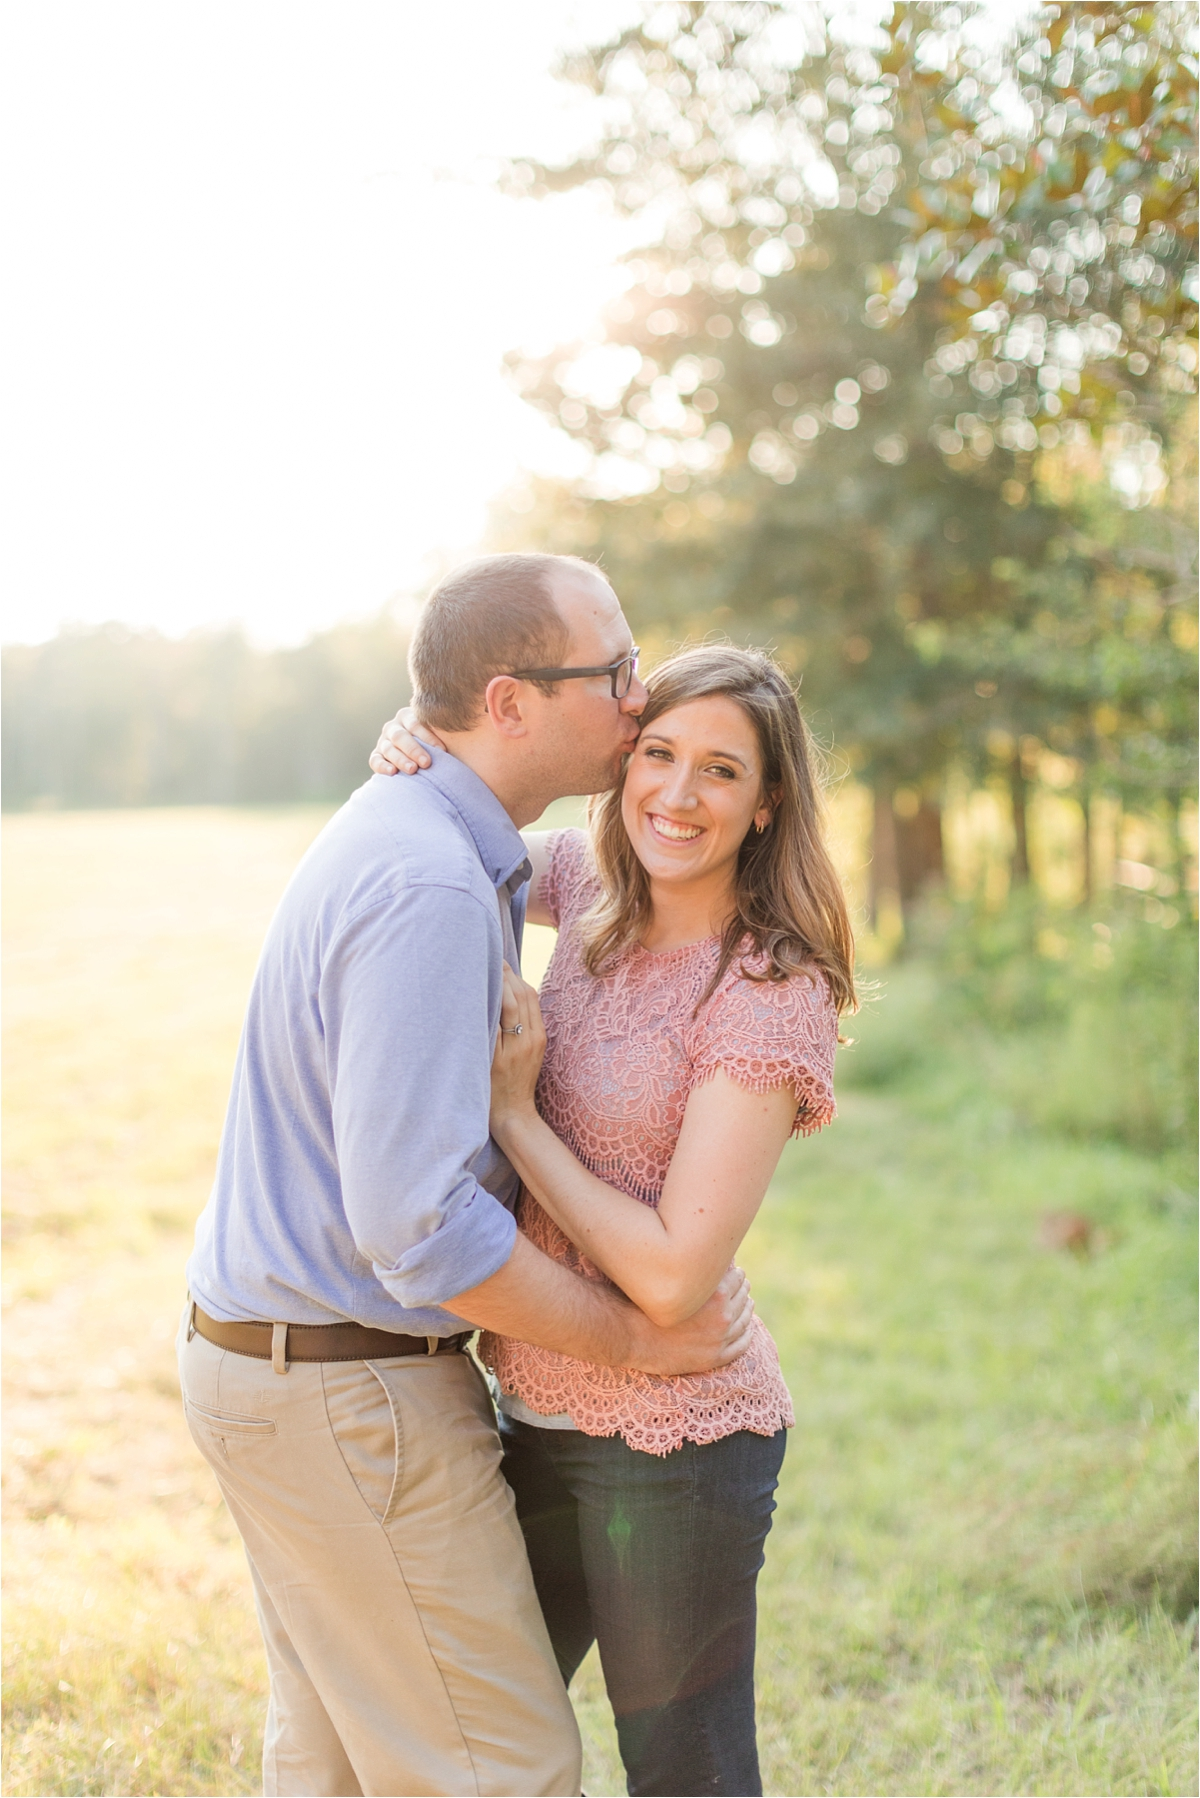 Alabama Countryside Engagement Session-Mandy + Greg-Country engagement-Outisde engagement